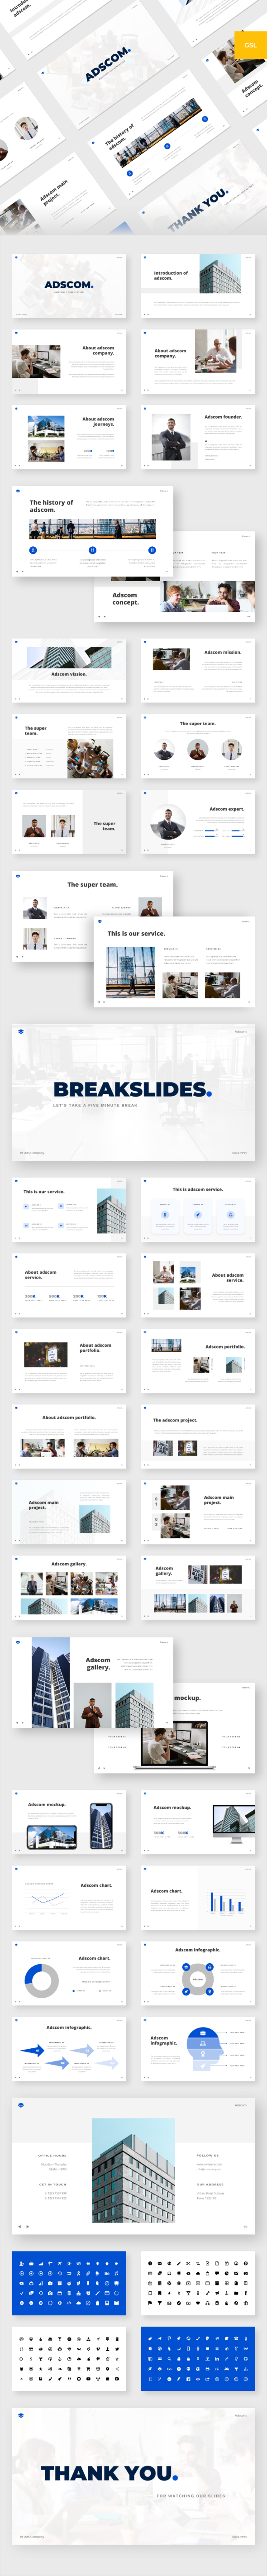 Adscom - Business Google Slides Template